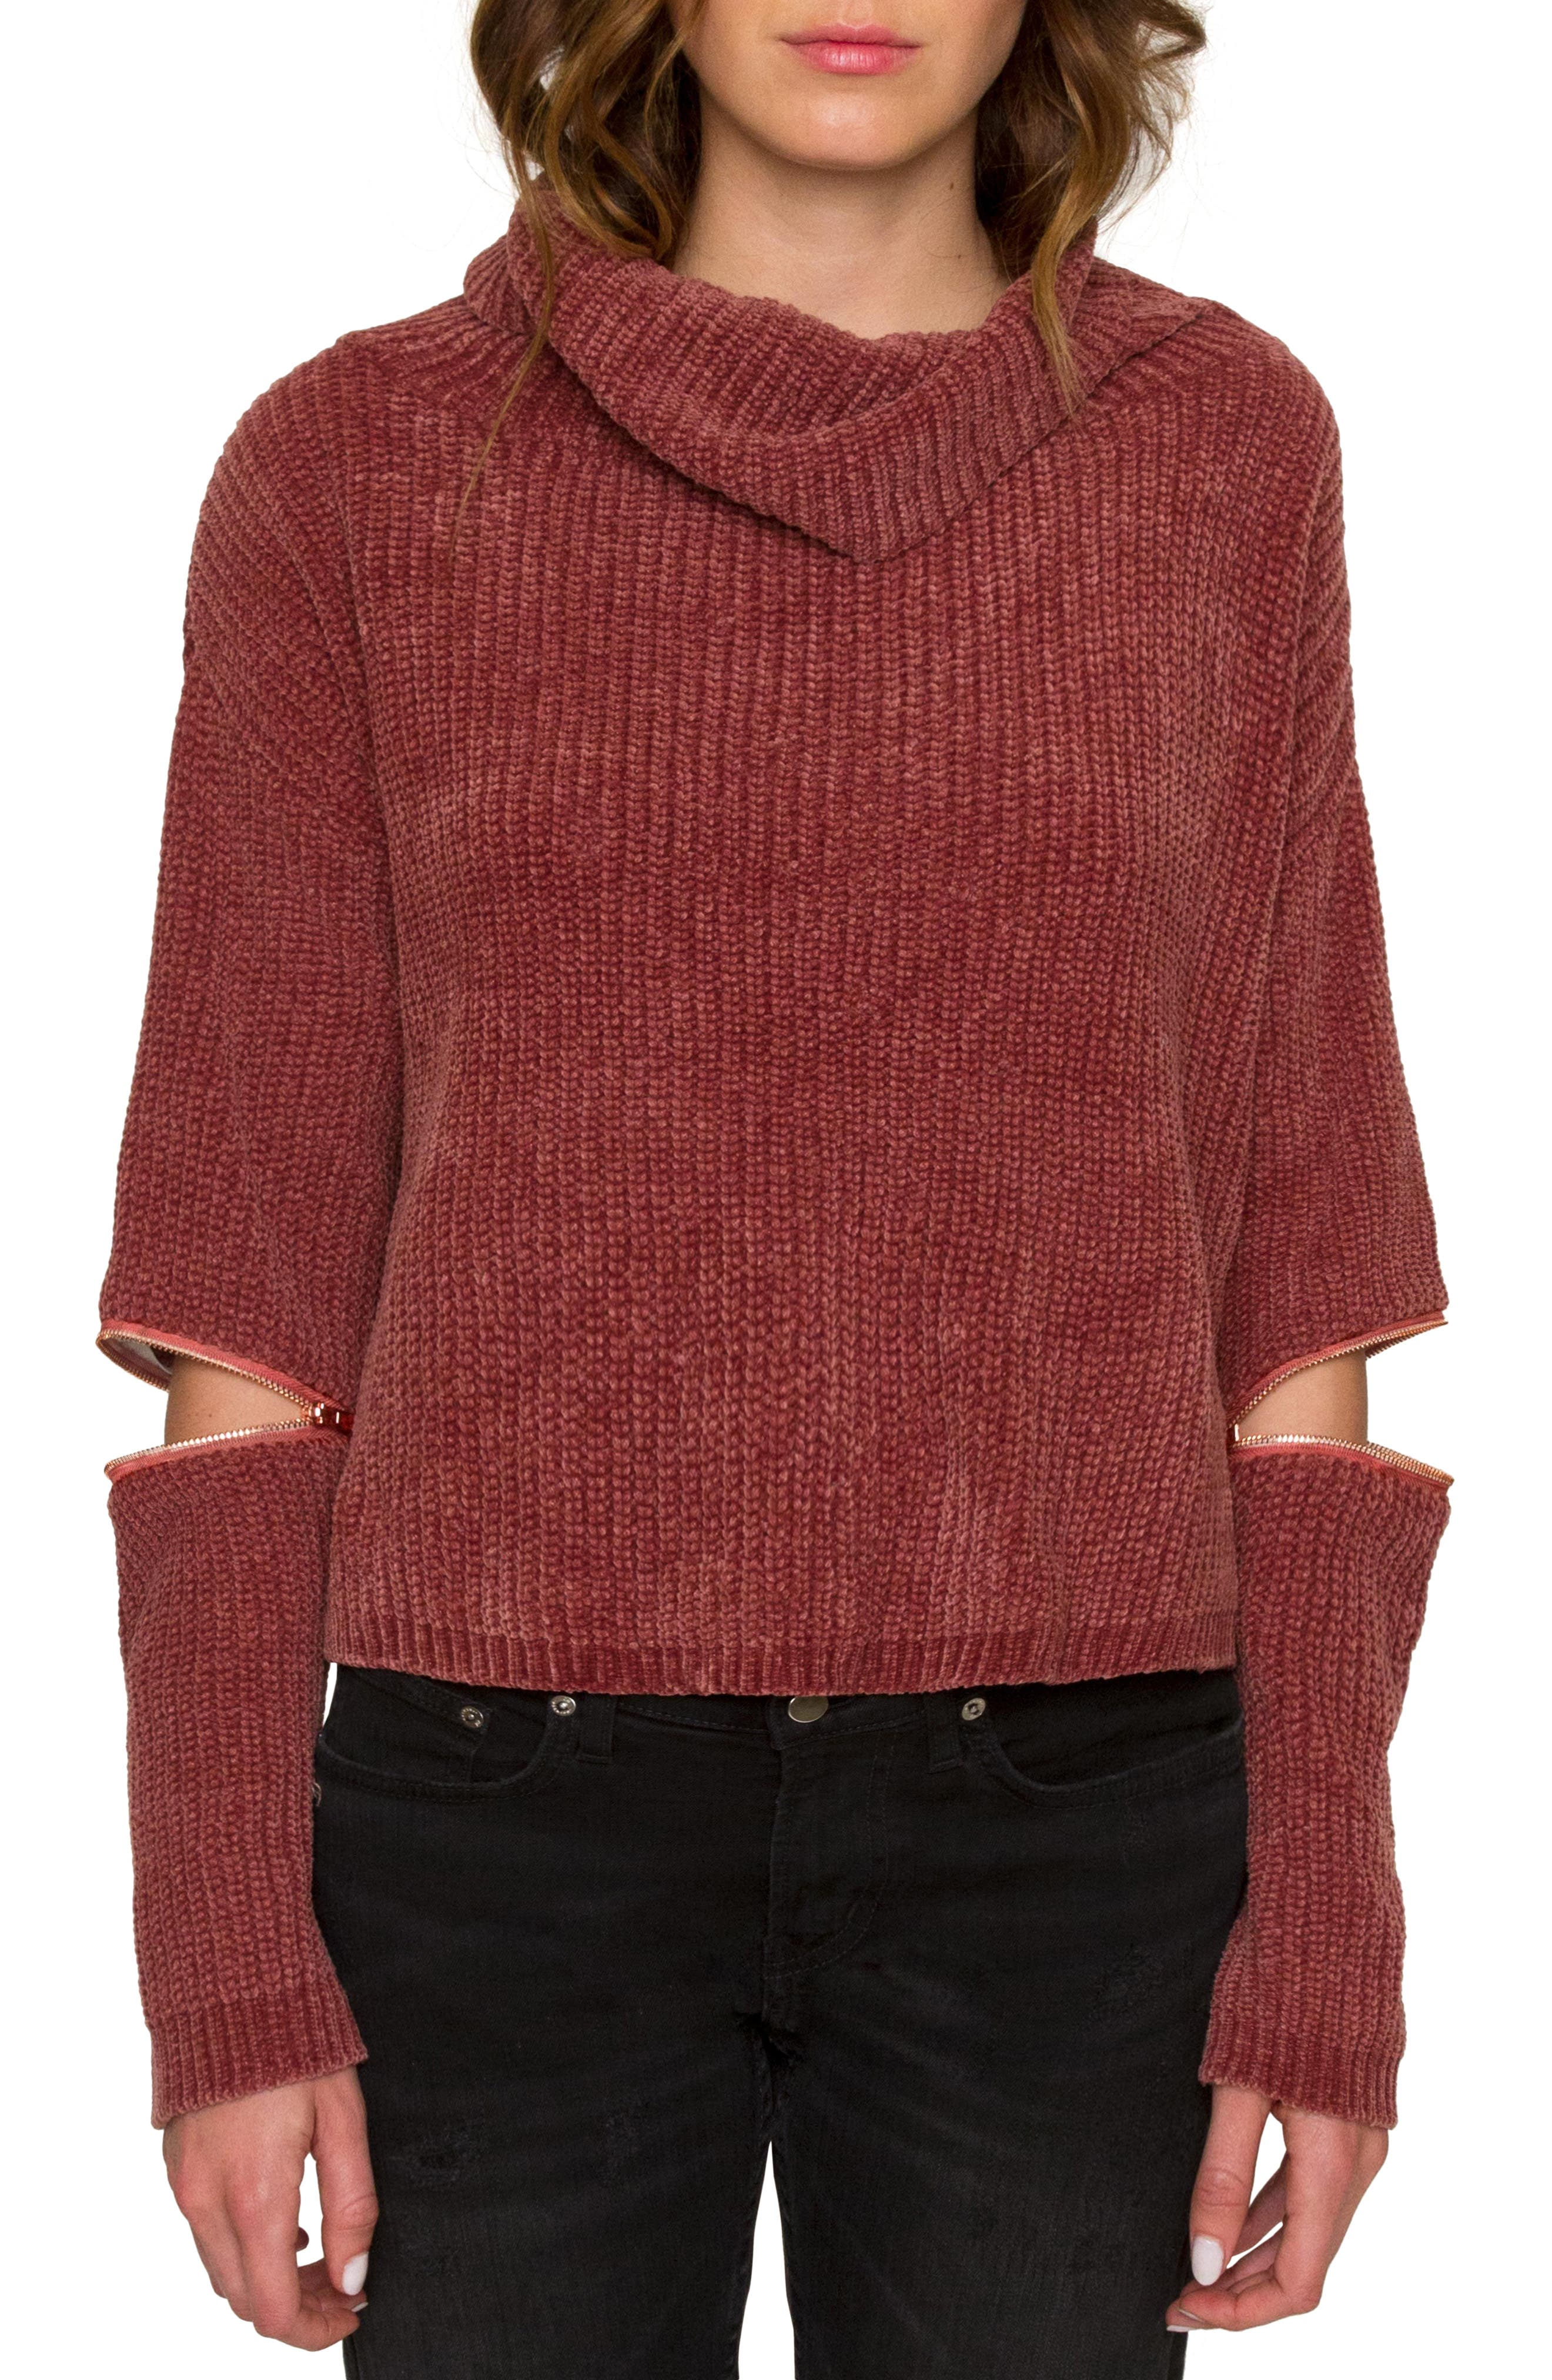 Alternate Image 1 Selected - Willow & Clay Zip Sleeve Turtleneck Sweater